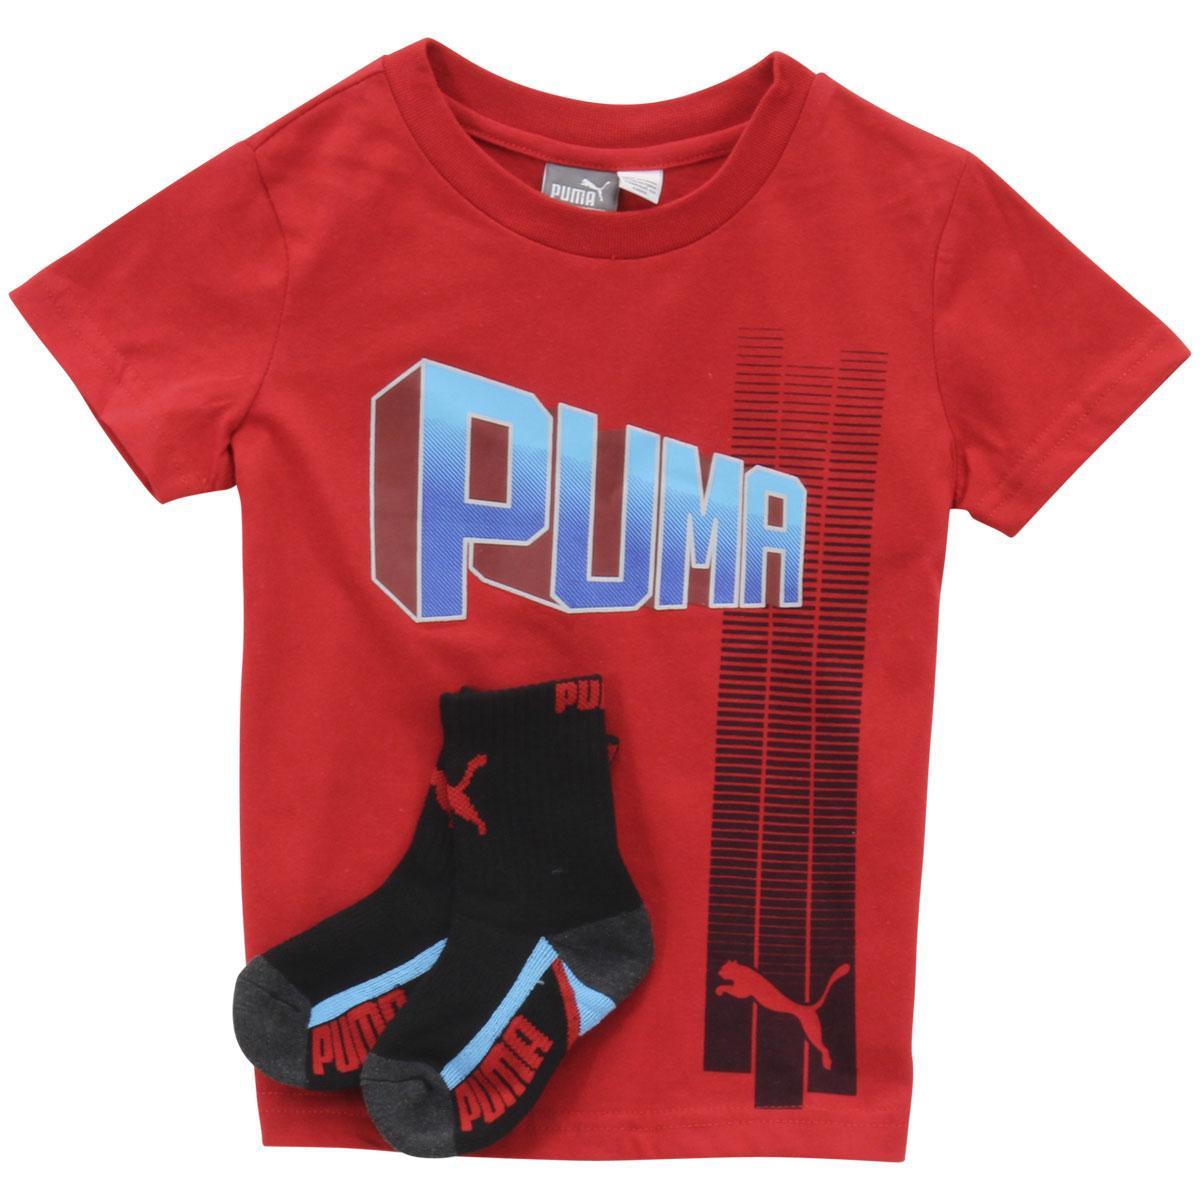 7334f2c618dc Puma Little Boy's 2-Piece 3D Logo Short Sleeve T-Shirt & Crew Socks Set